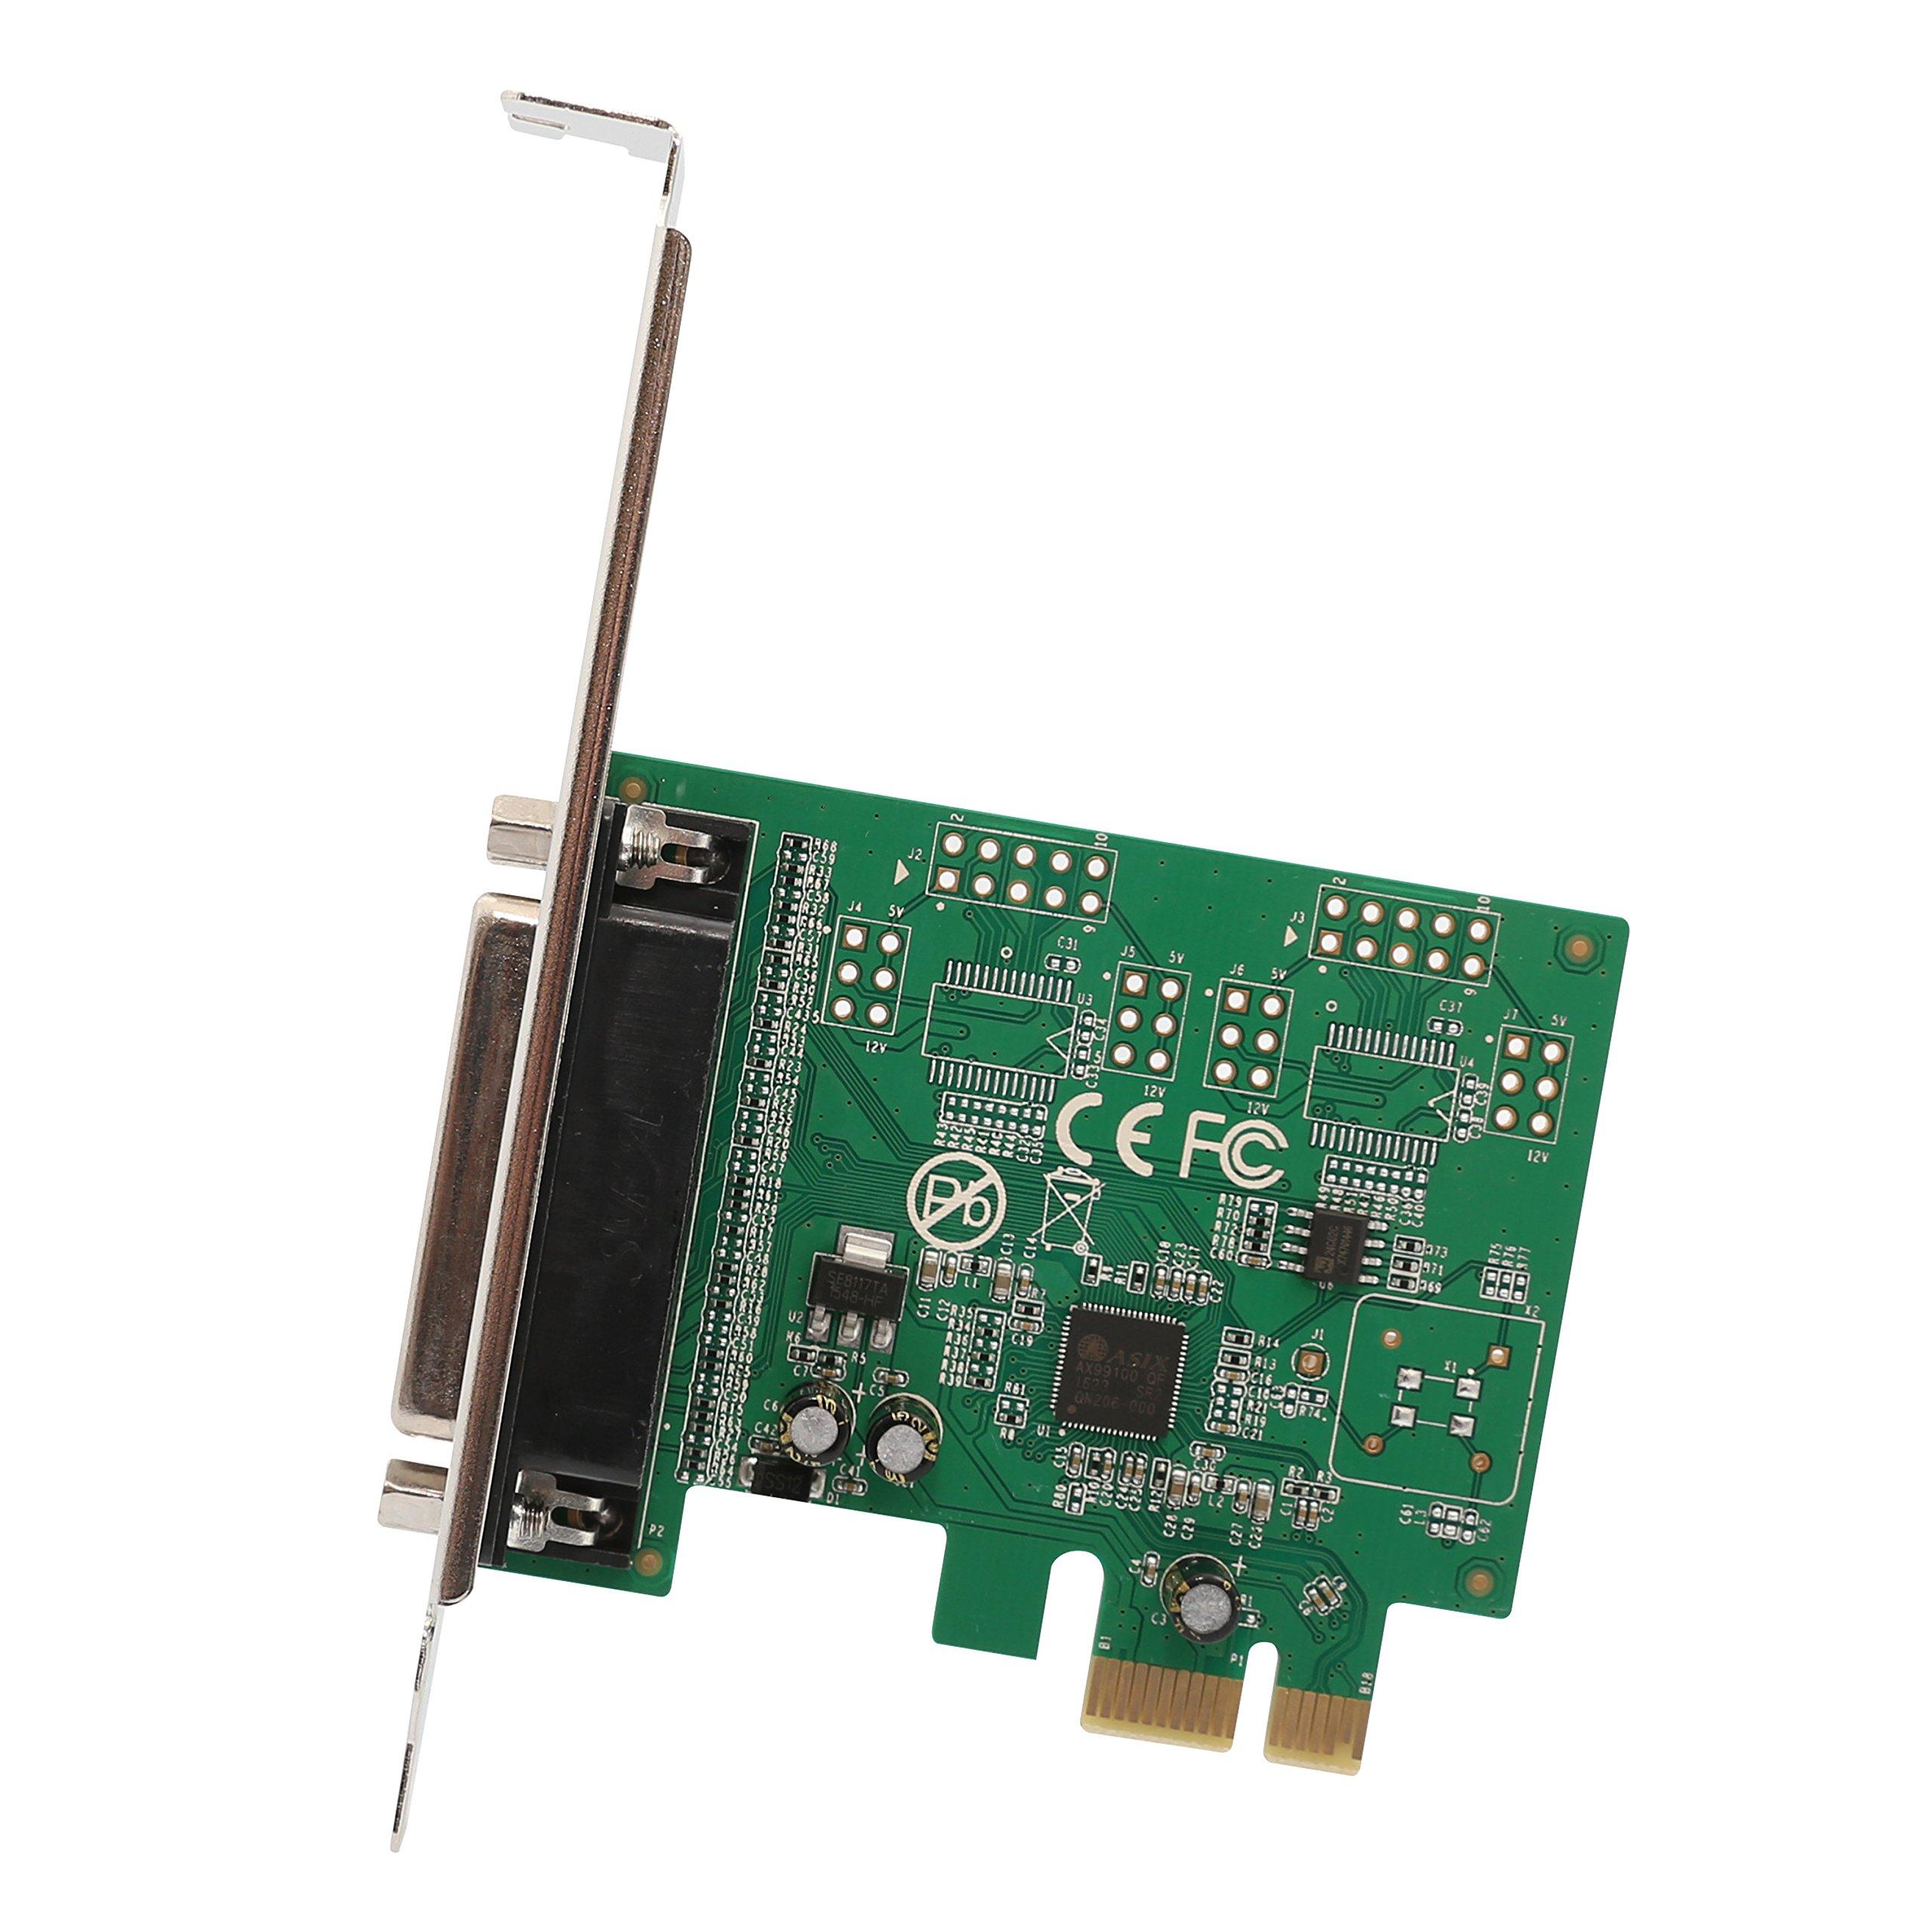 Tarjeta Paralela Io Crest 1 Puerto Pcie X1, Pci Express A Db25 Lpt Impresora Convertidor Adaptador Controlador Con Sopor